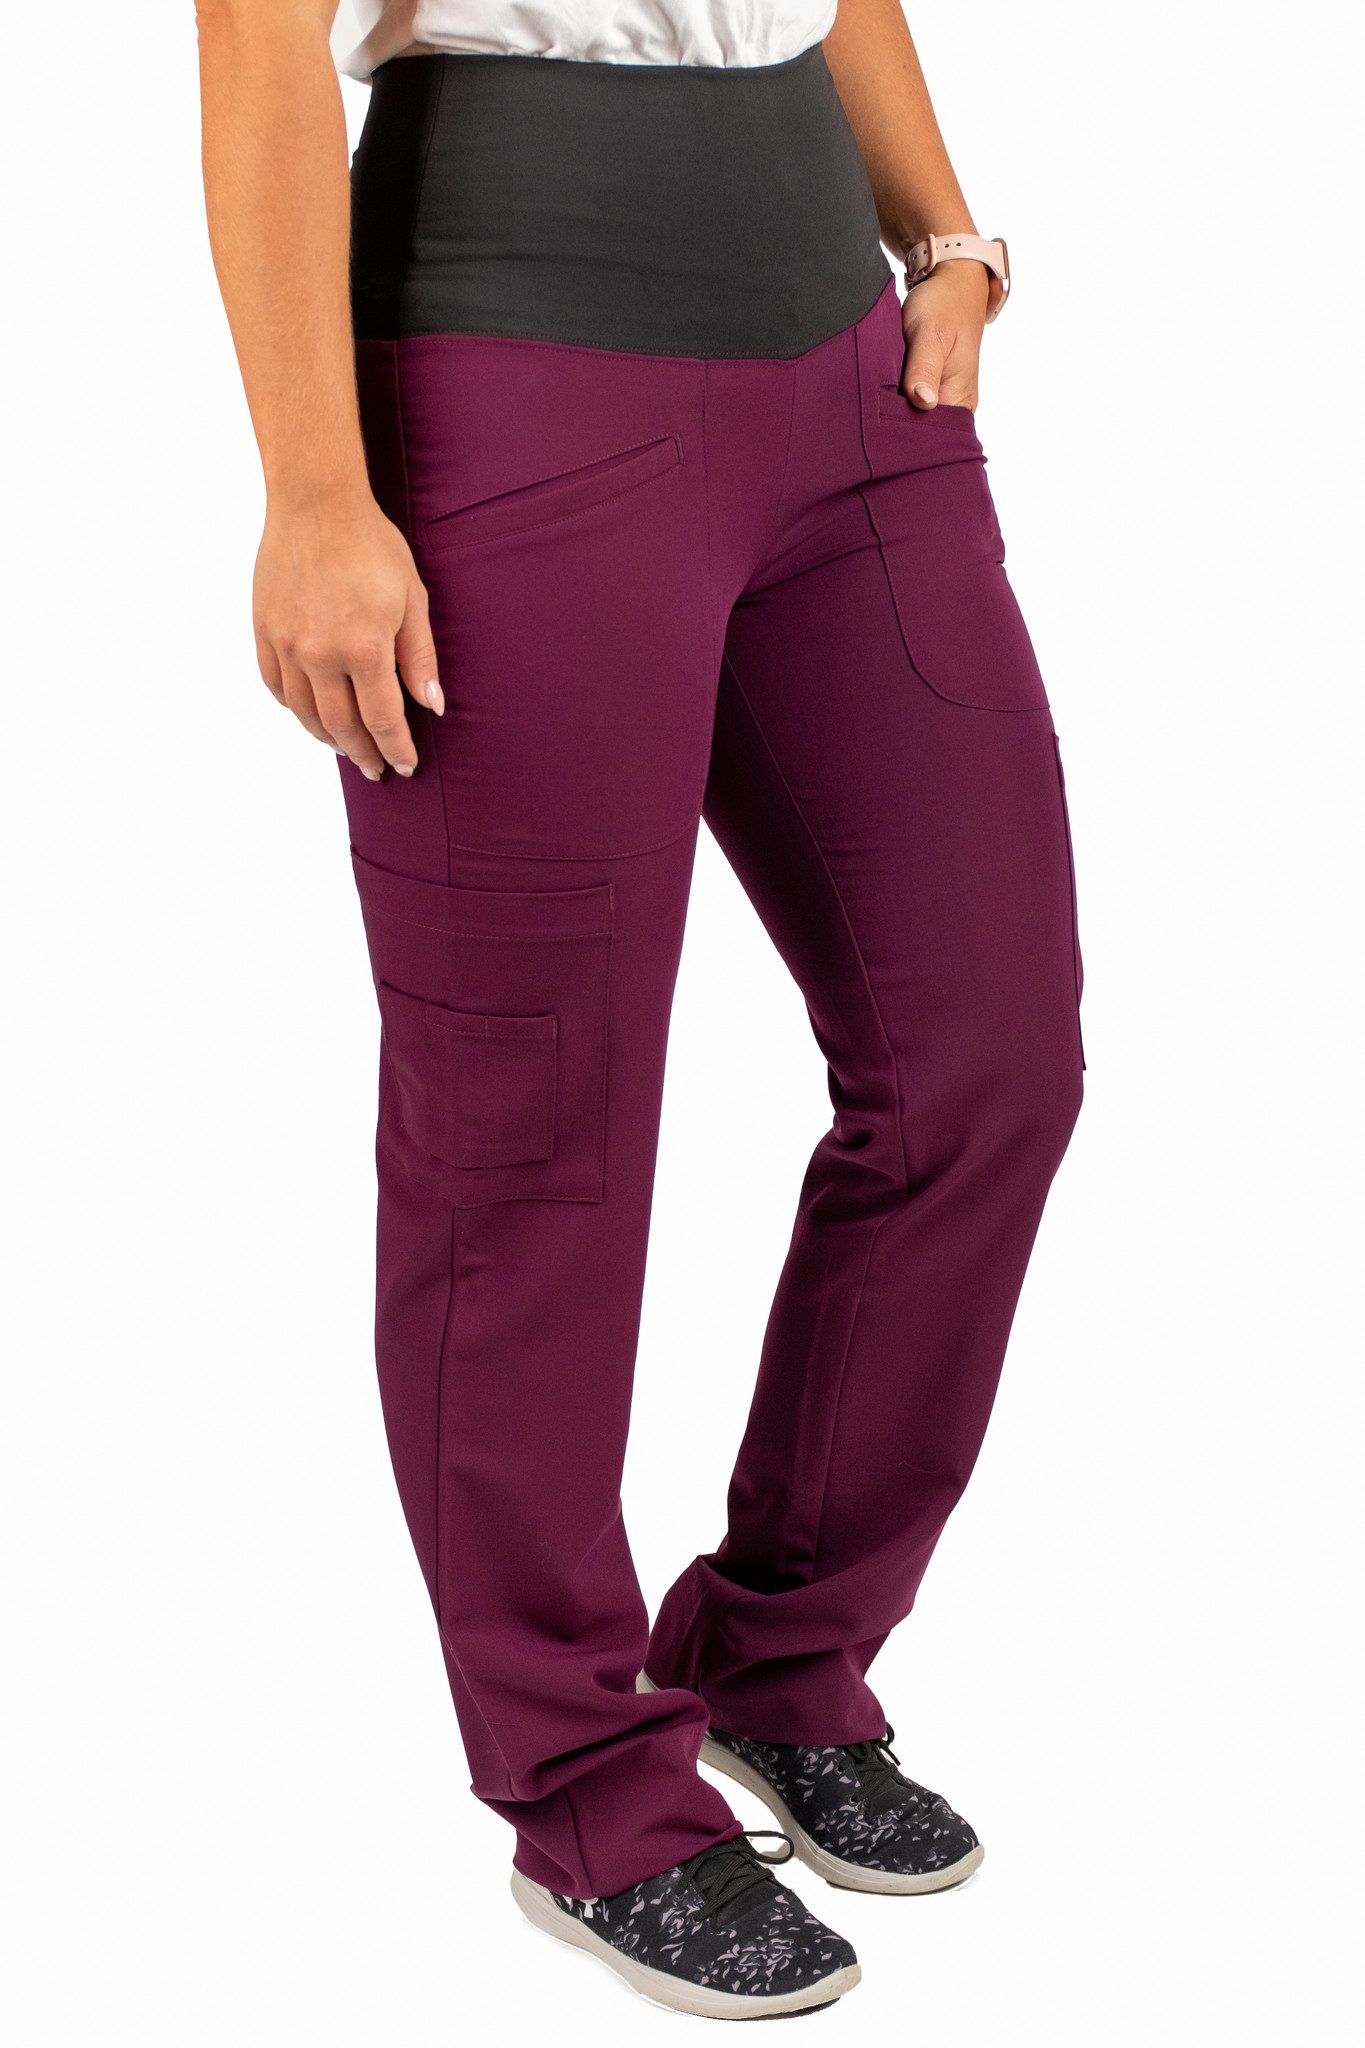 Burgundy Women's Yoga Waistband Pants 985